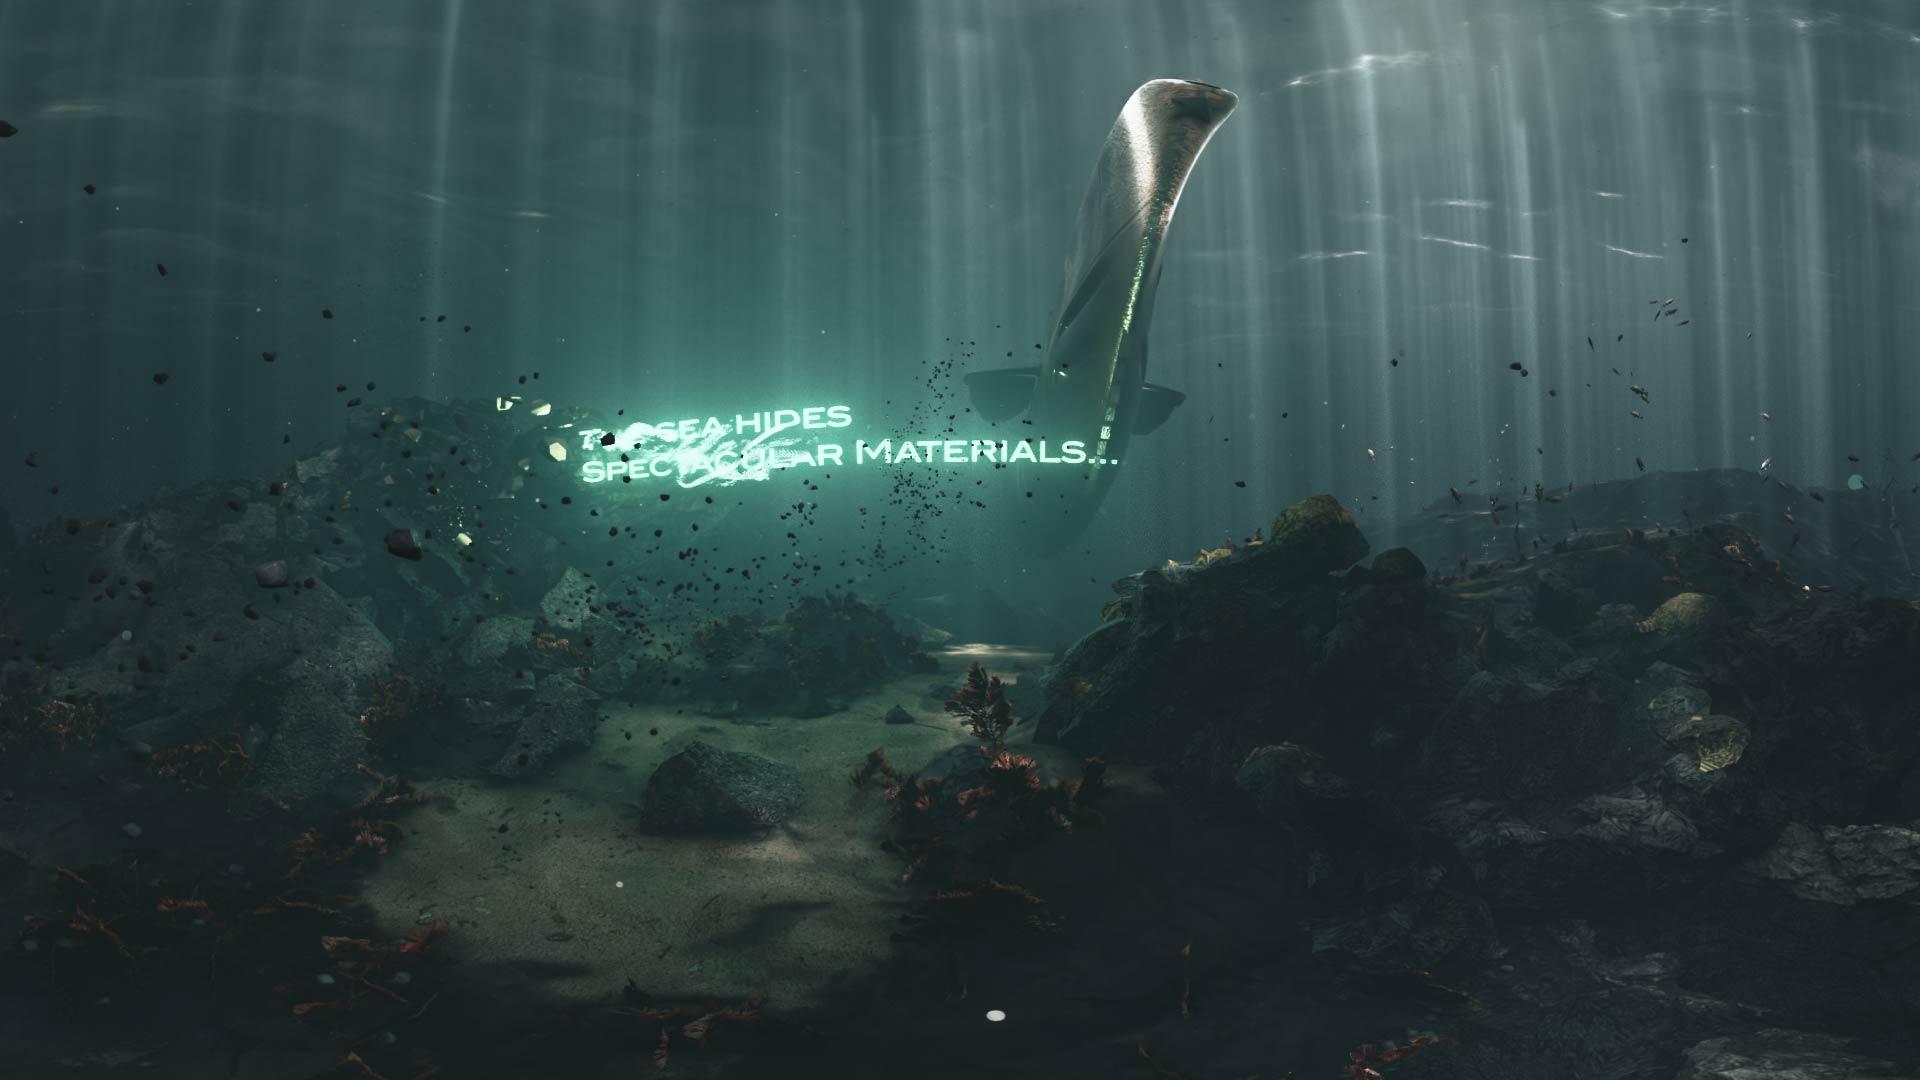 3D render of a submarine passing through underwater corals